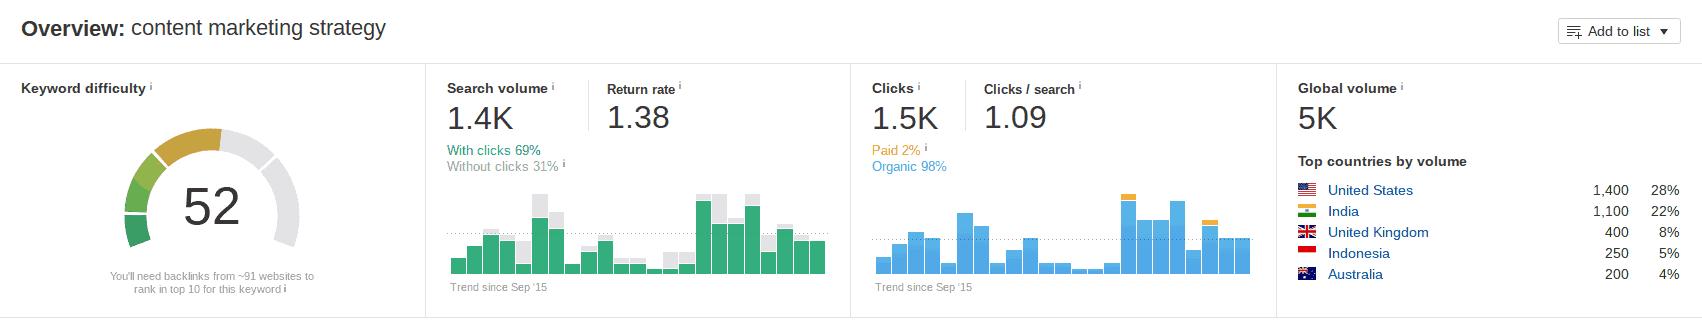 content-marketing-strategy-keyword